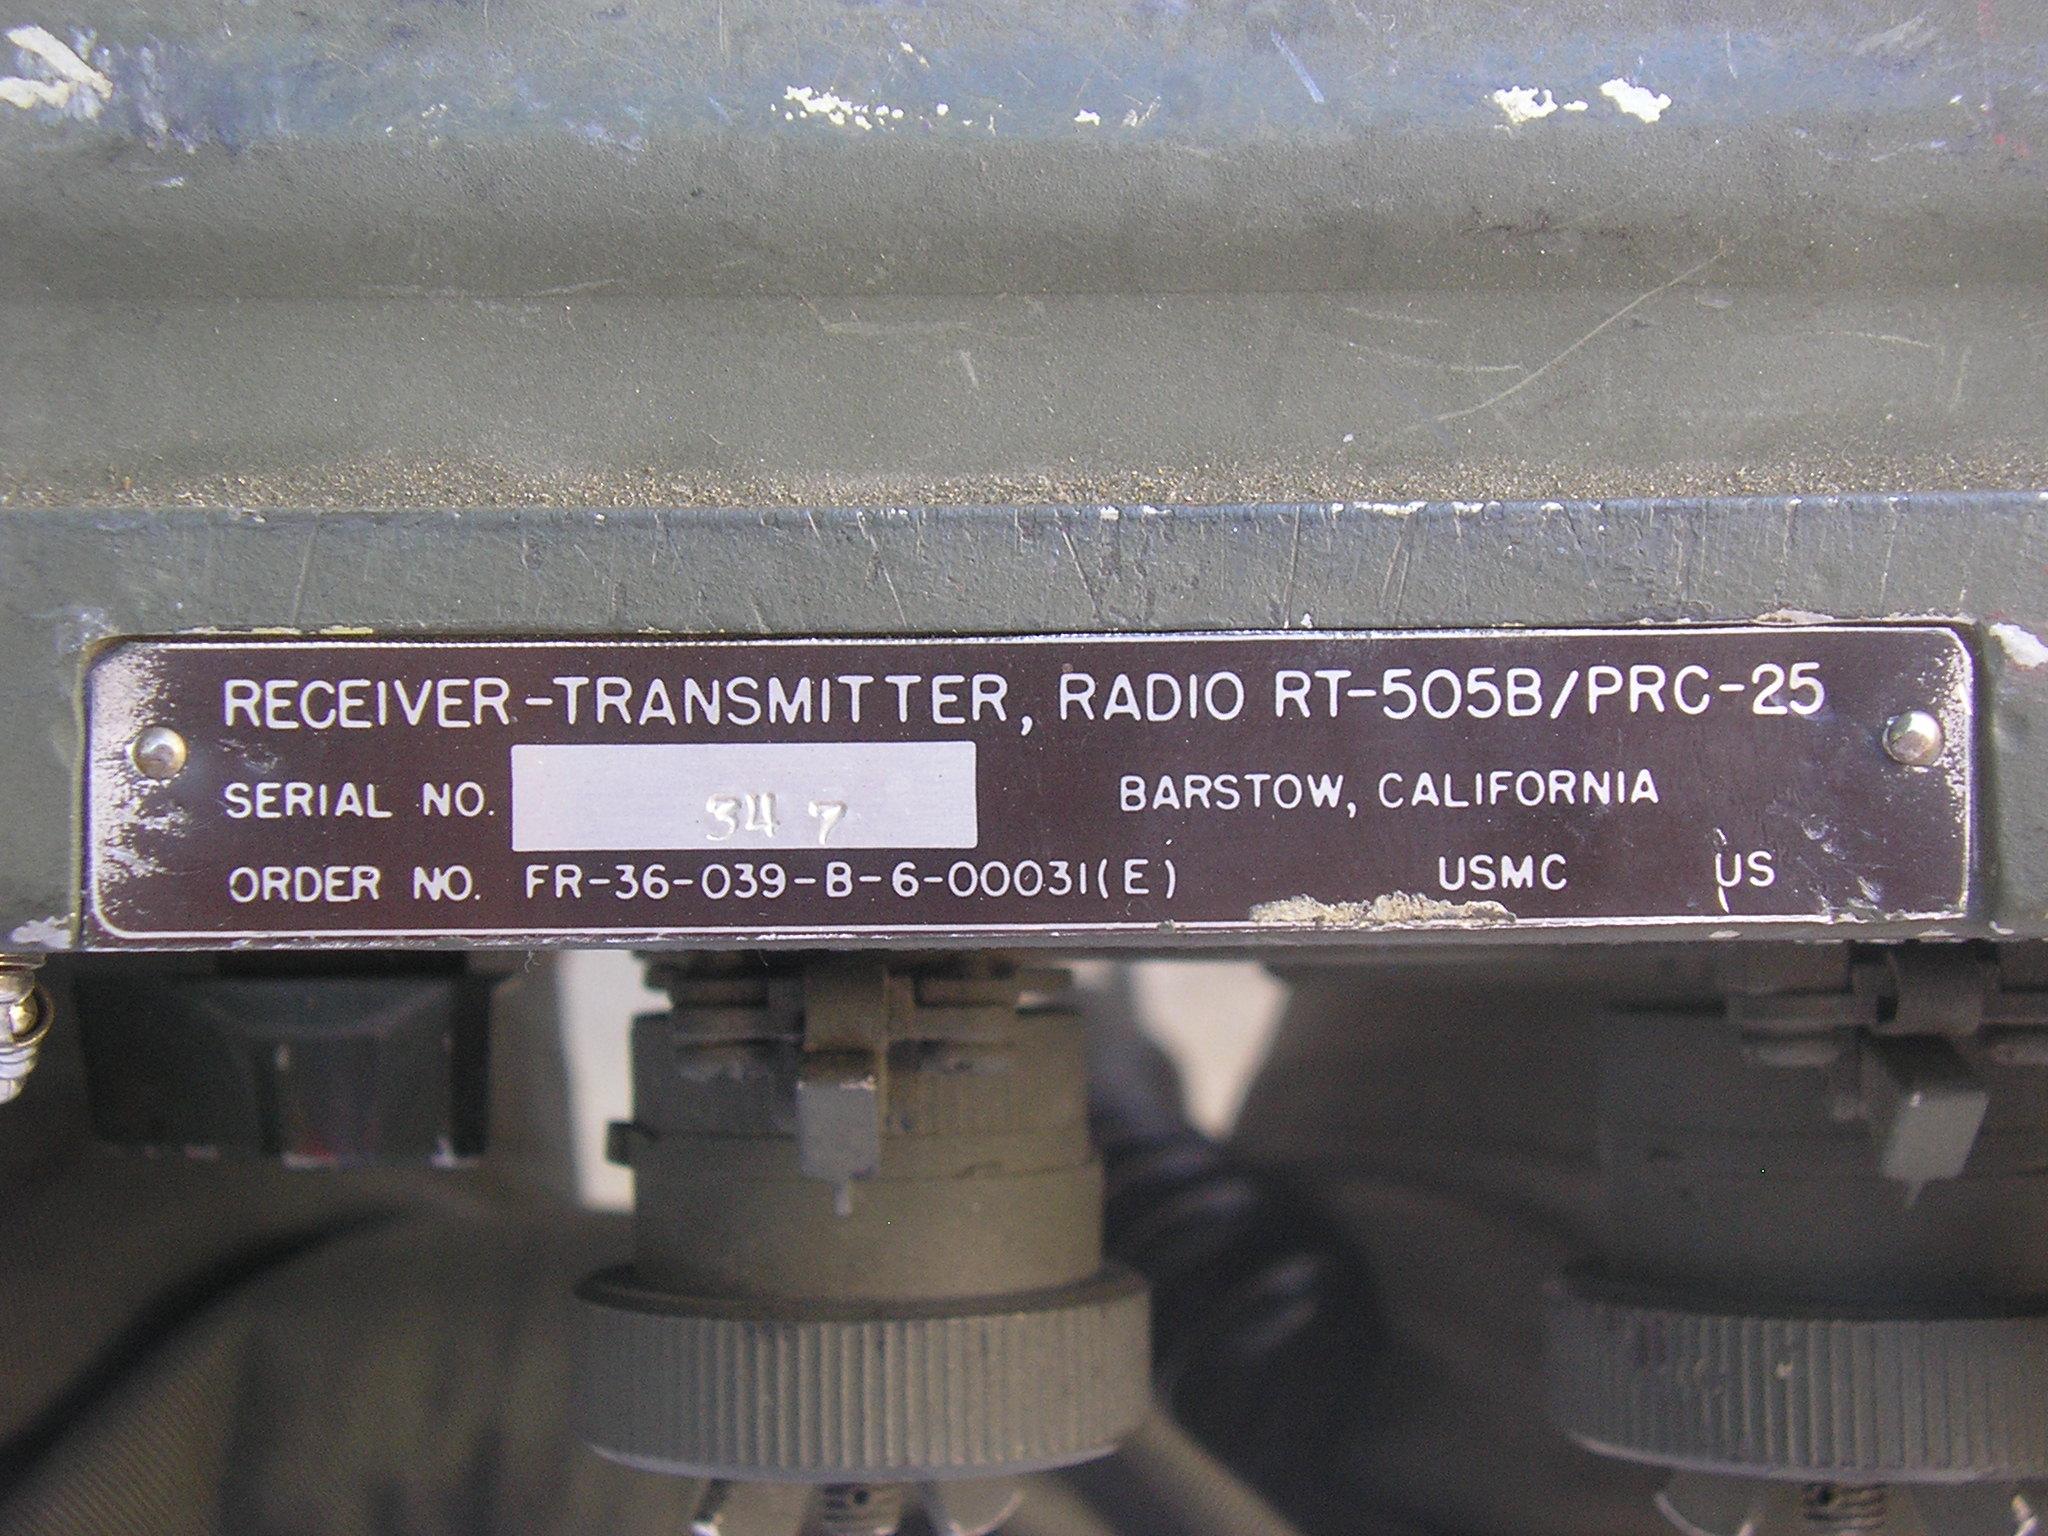 RT-505B/PRC-25